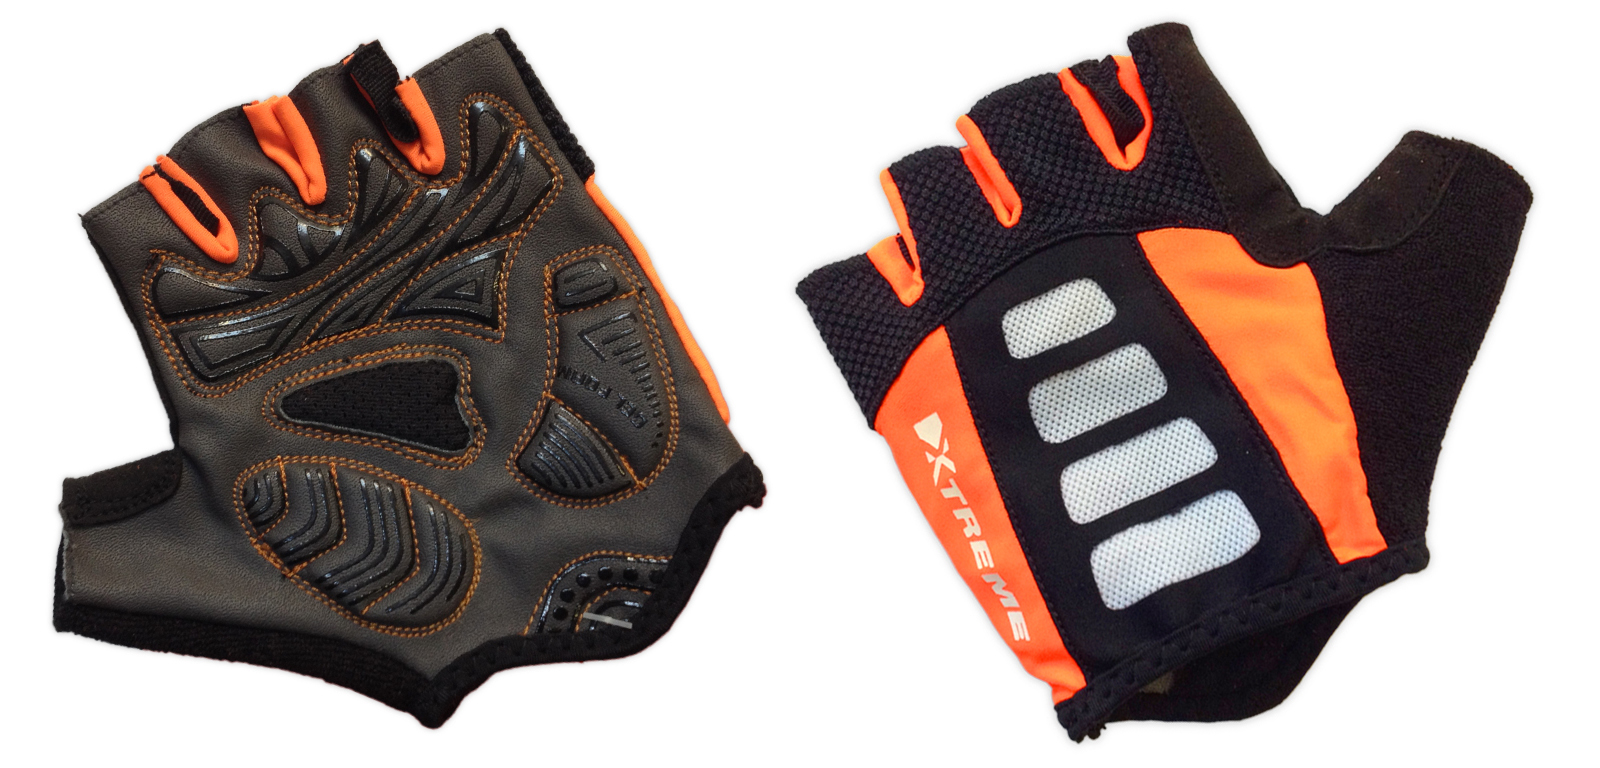 XTreme X-Guard - Cykelhandske - Sort/orange - Kort | Gloves